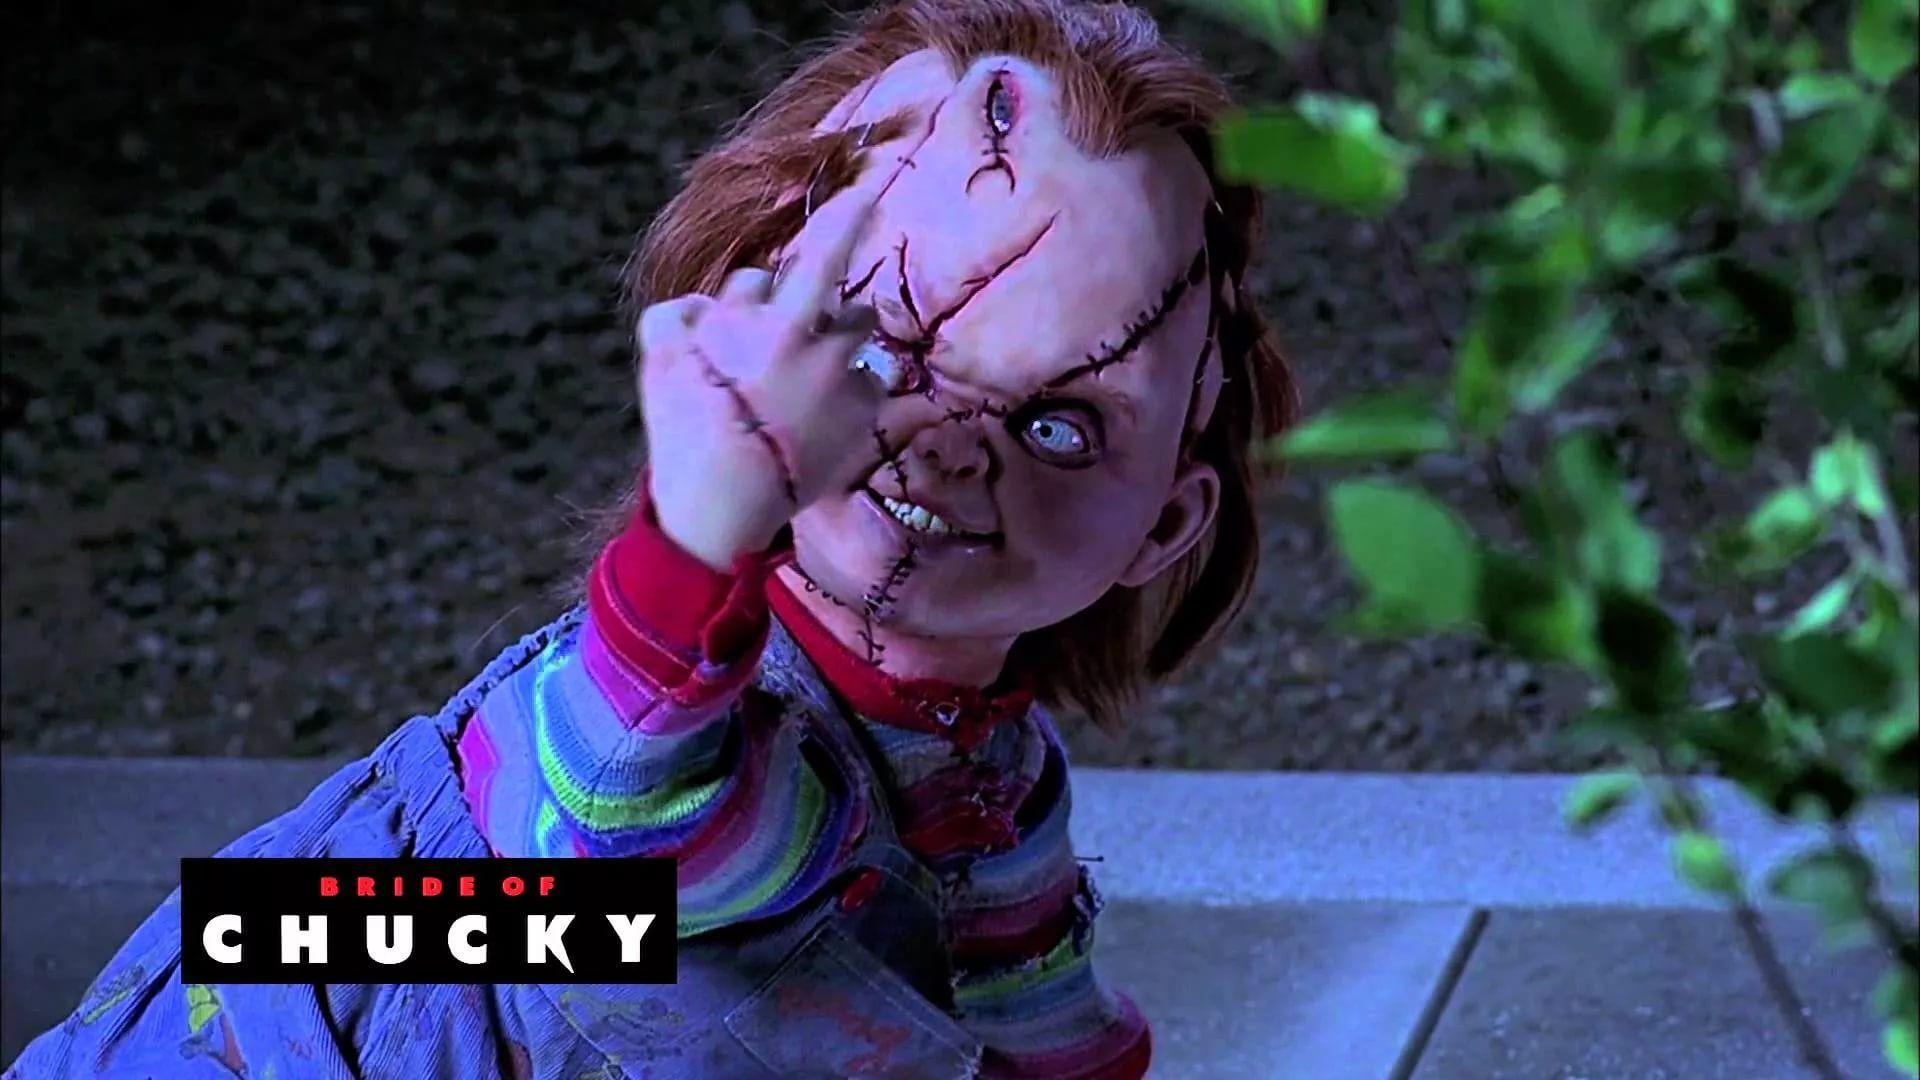 Chucky Doll 1920x1080 wallpaper